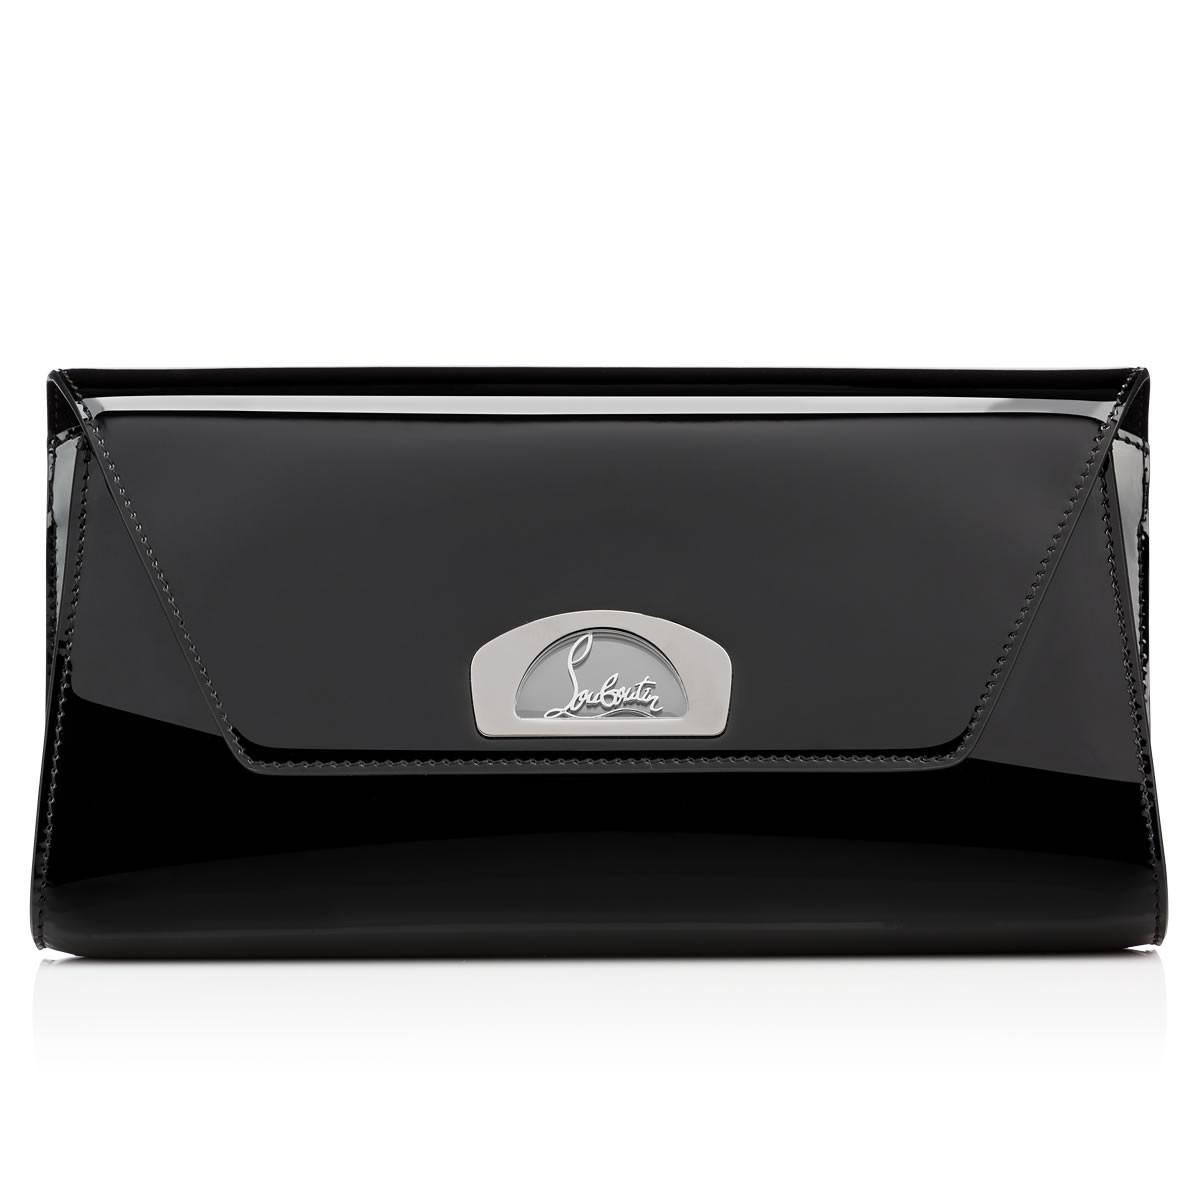 370708dd619f Christian Louboutin Vero-dodat Clutch Black Patent Calfskin in Black ...